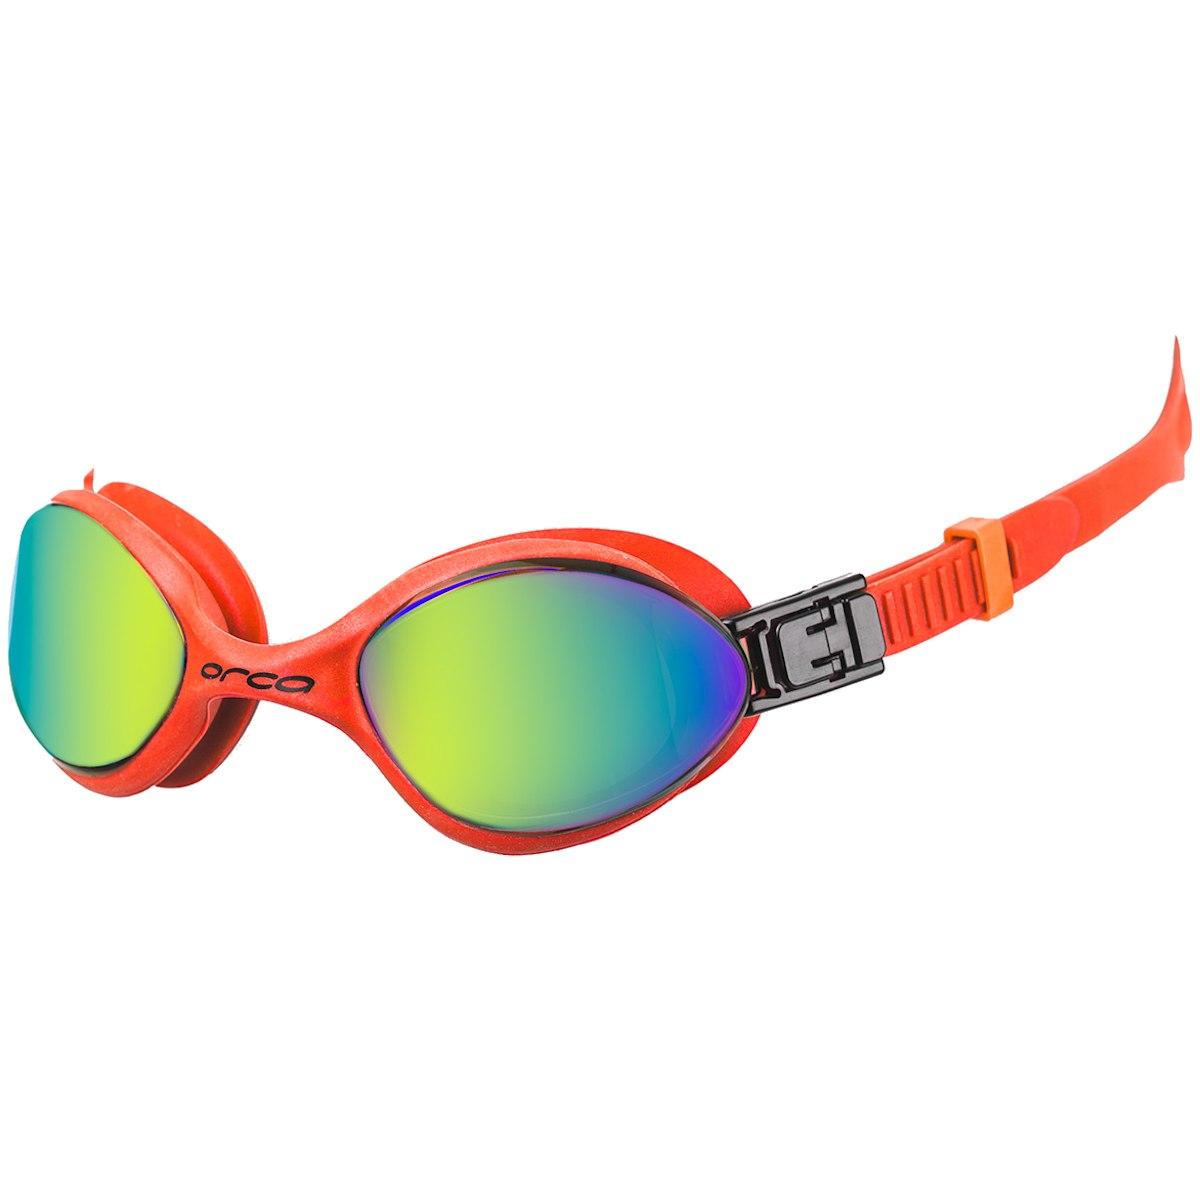 Orca Killa 180° Goggle - high vis orange